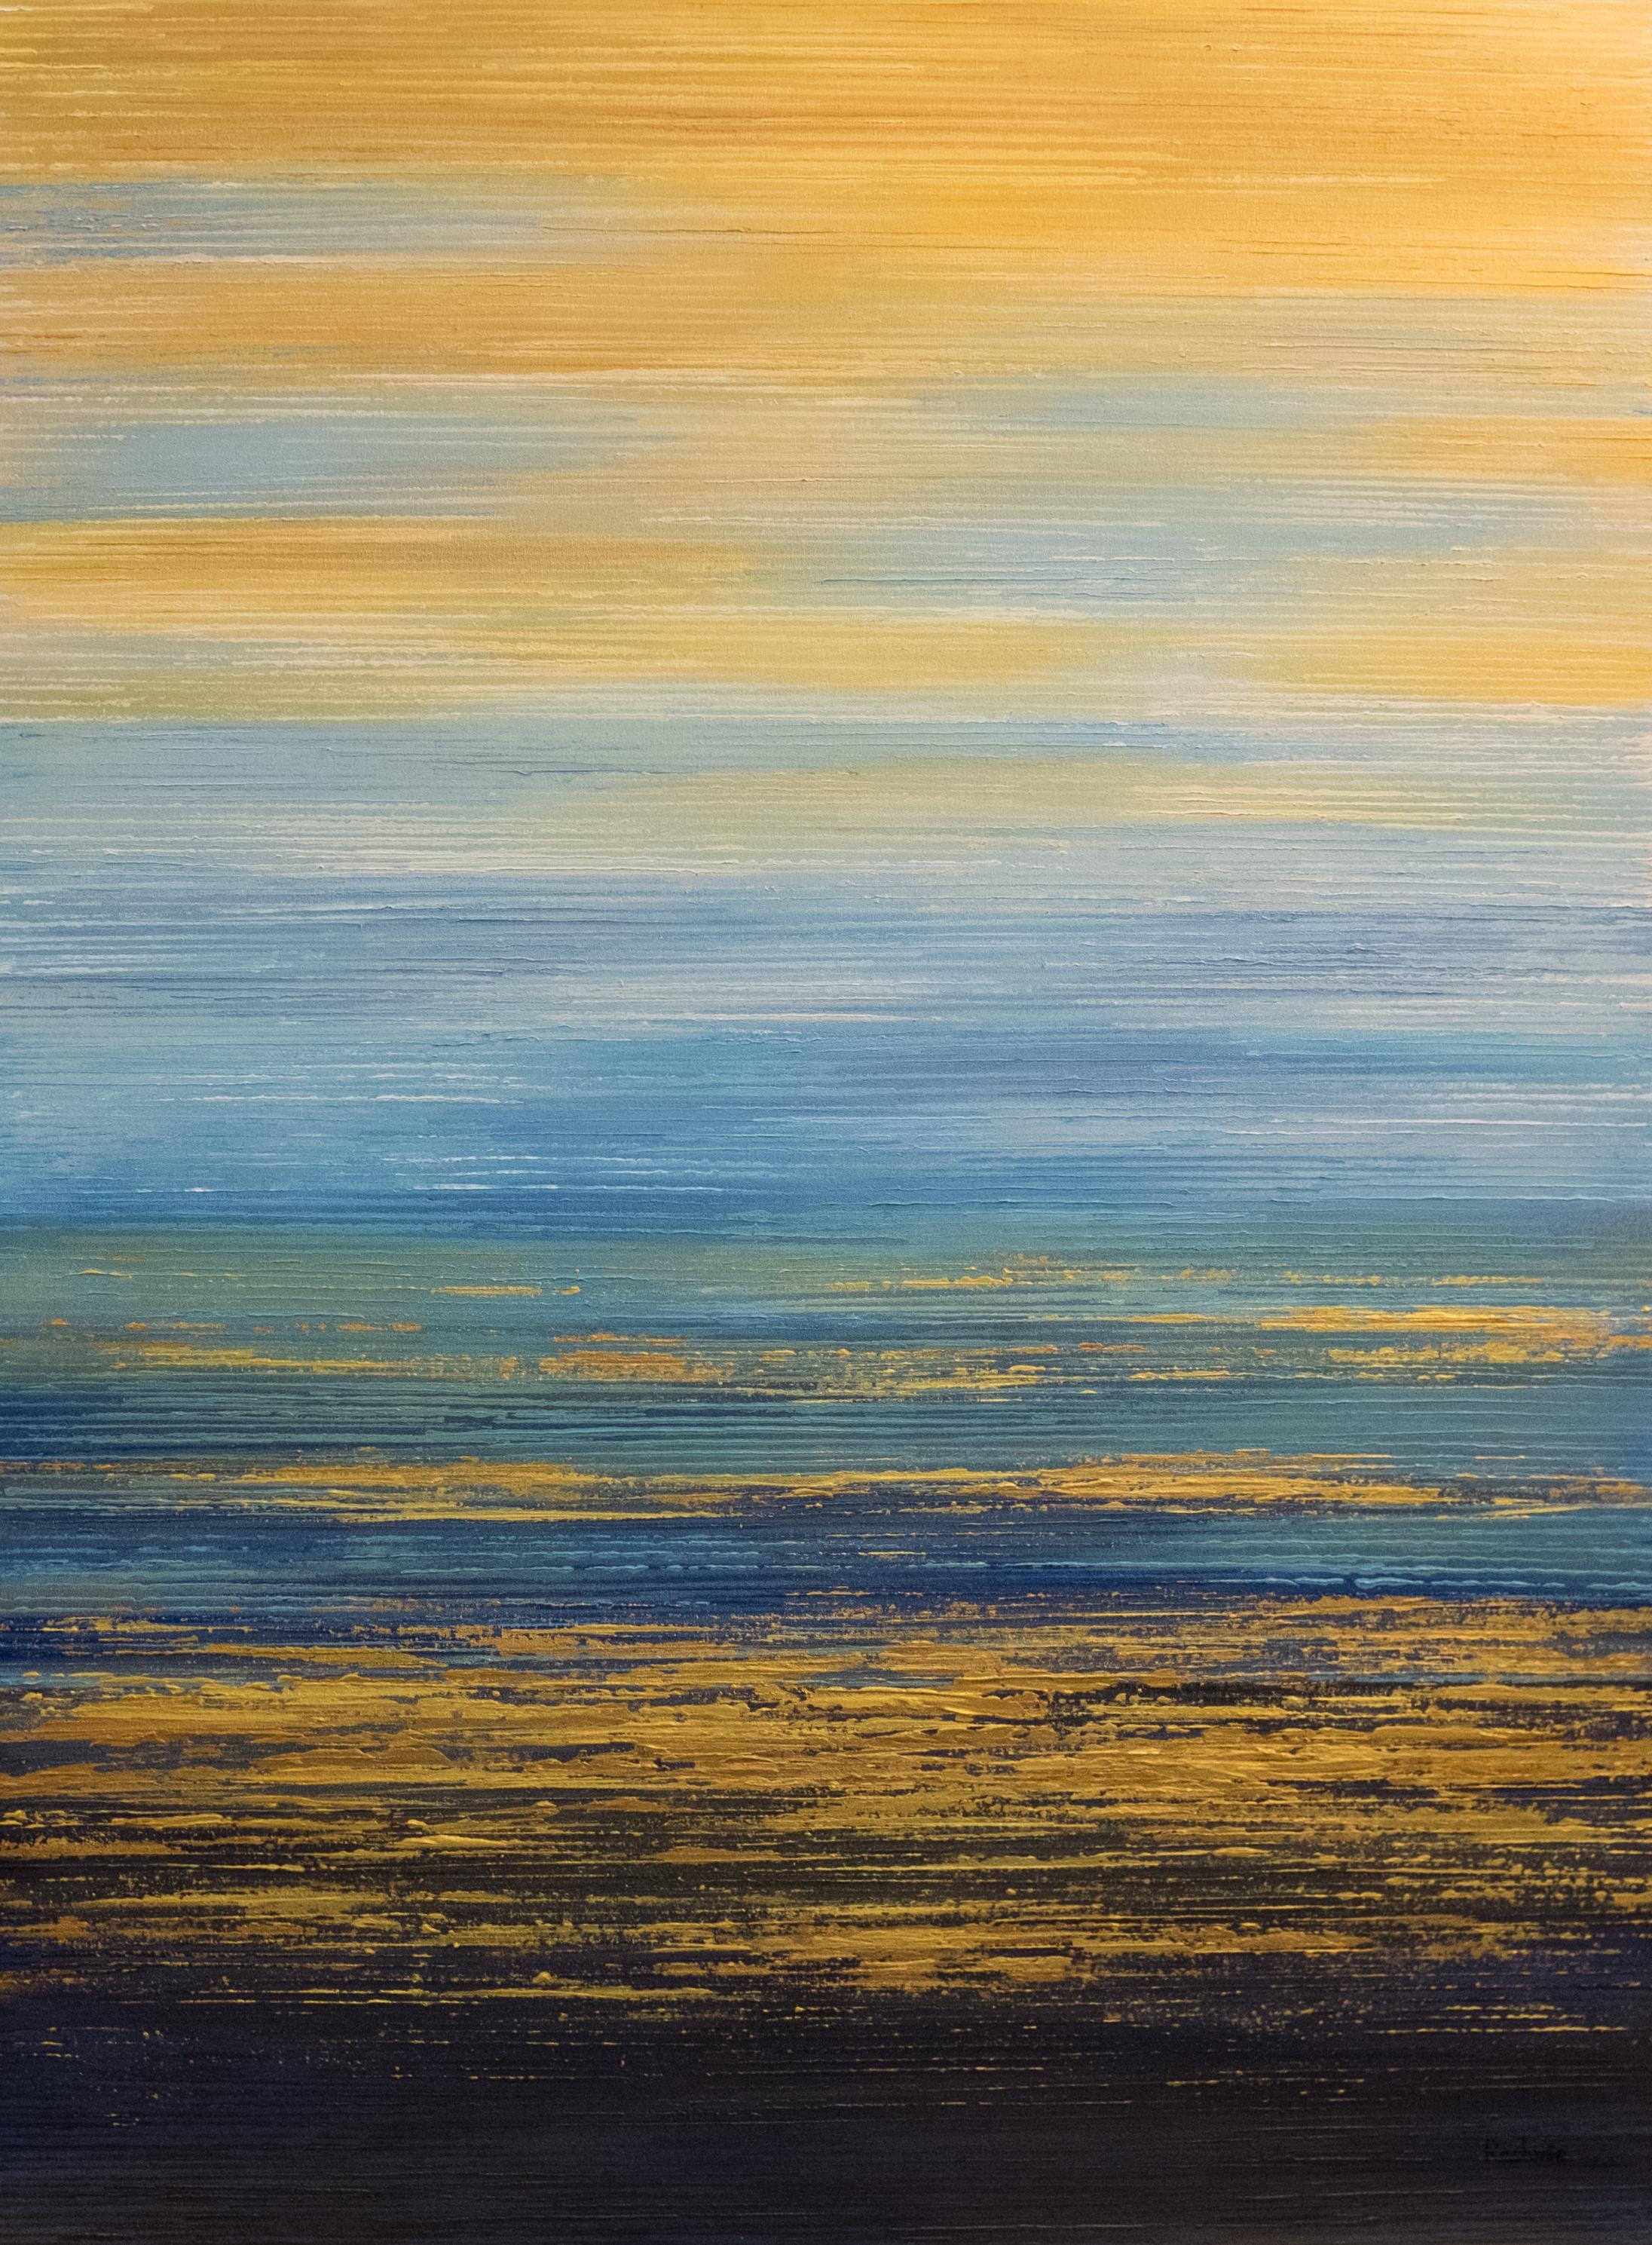 Seascape VII - Sky Blue/Gold - 2015